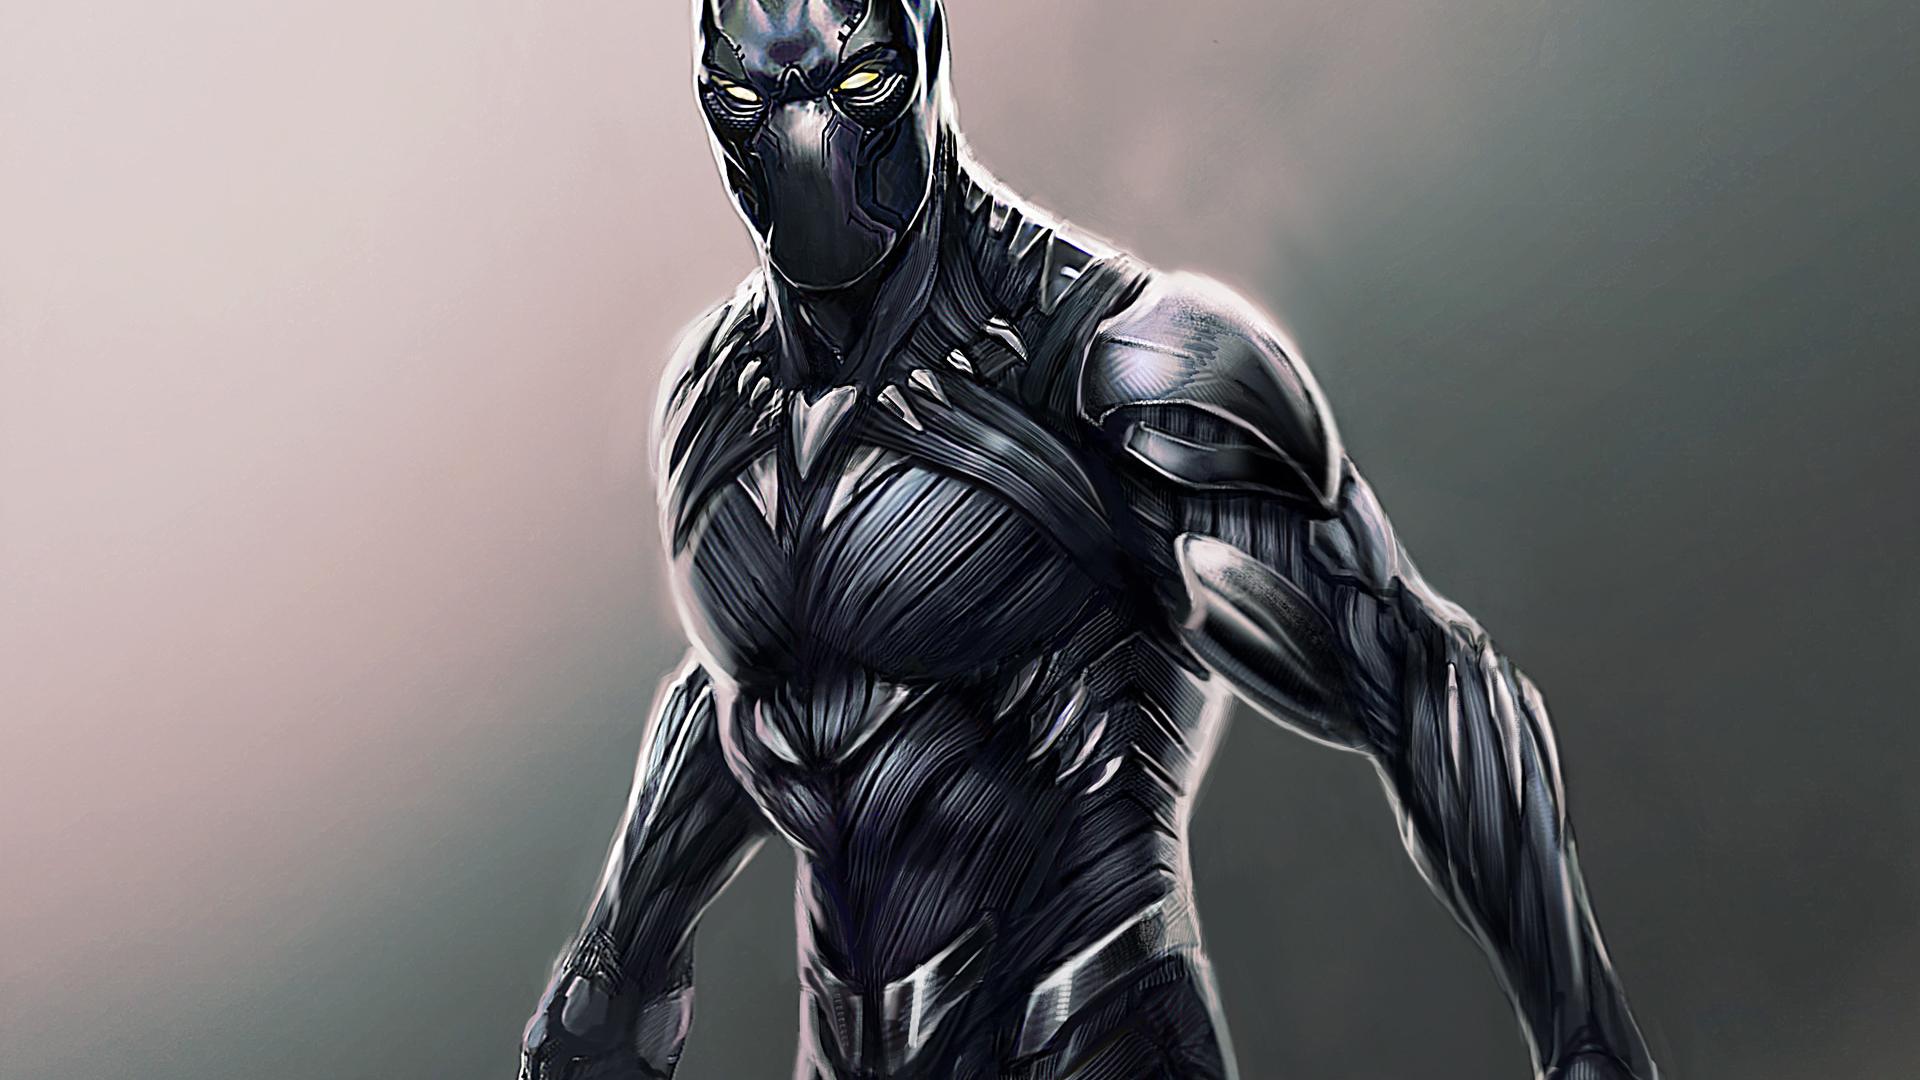 Download 1920x1080 Wallpaper Black Panther Superhero Fan Made Digital Artwork Full Hd Hdtv Fhd 1080p 1920x1080 Hd Image Background 2477